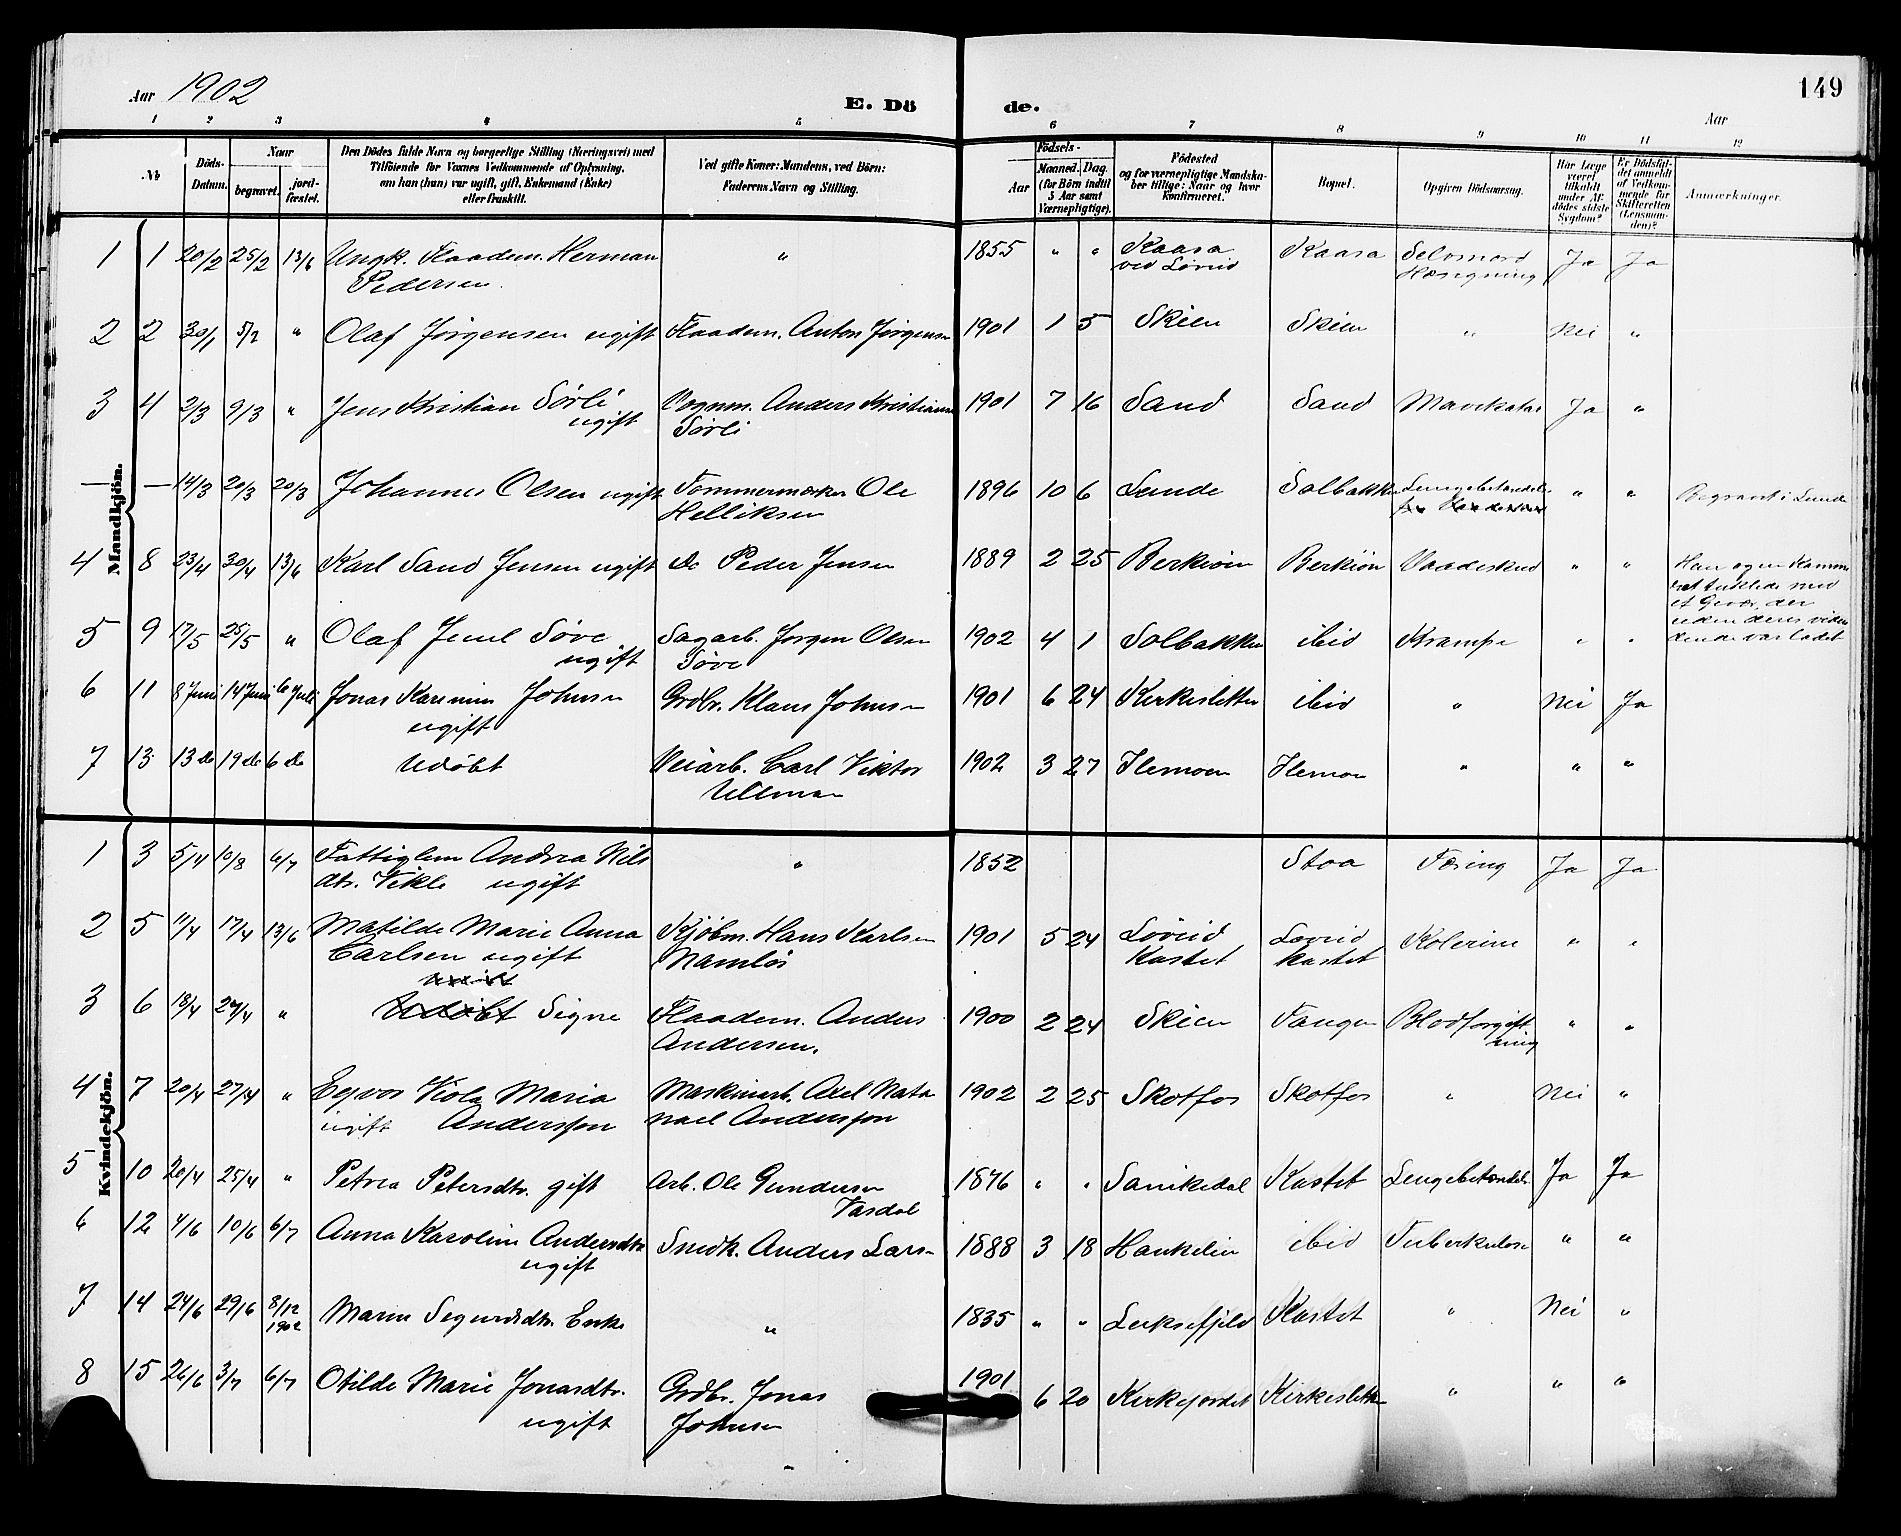 SAKO, Solum kirkebøker, G/Gb/L0004: Klokkerbok nr. II 4, 1898-1905, s. 149